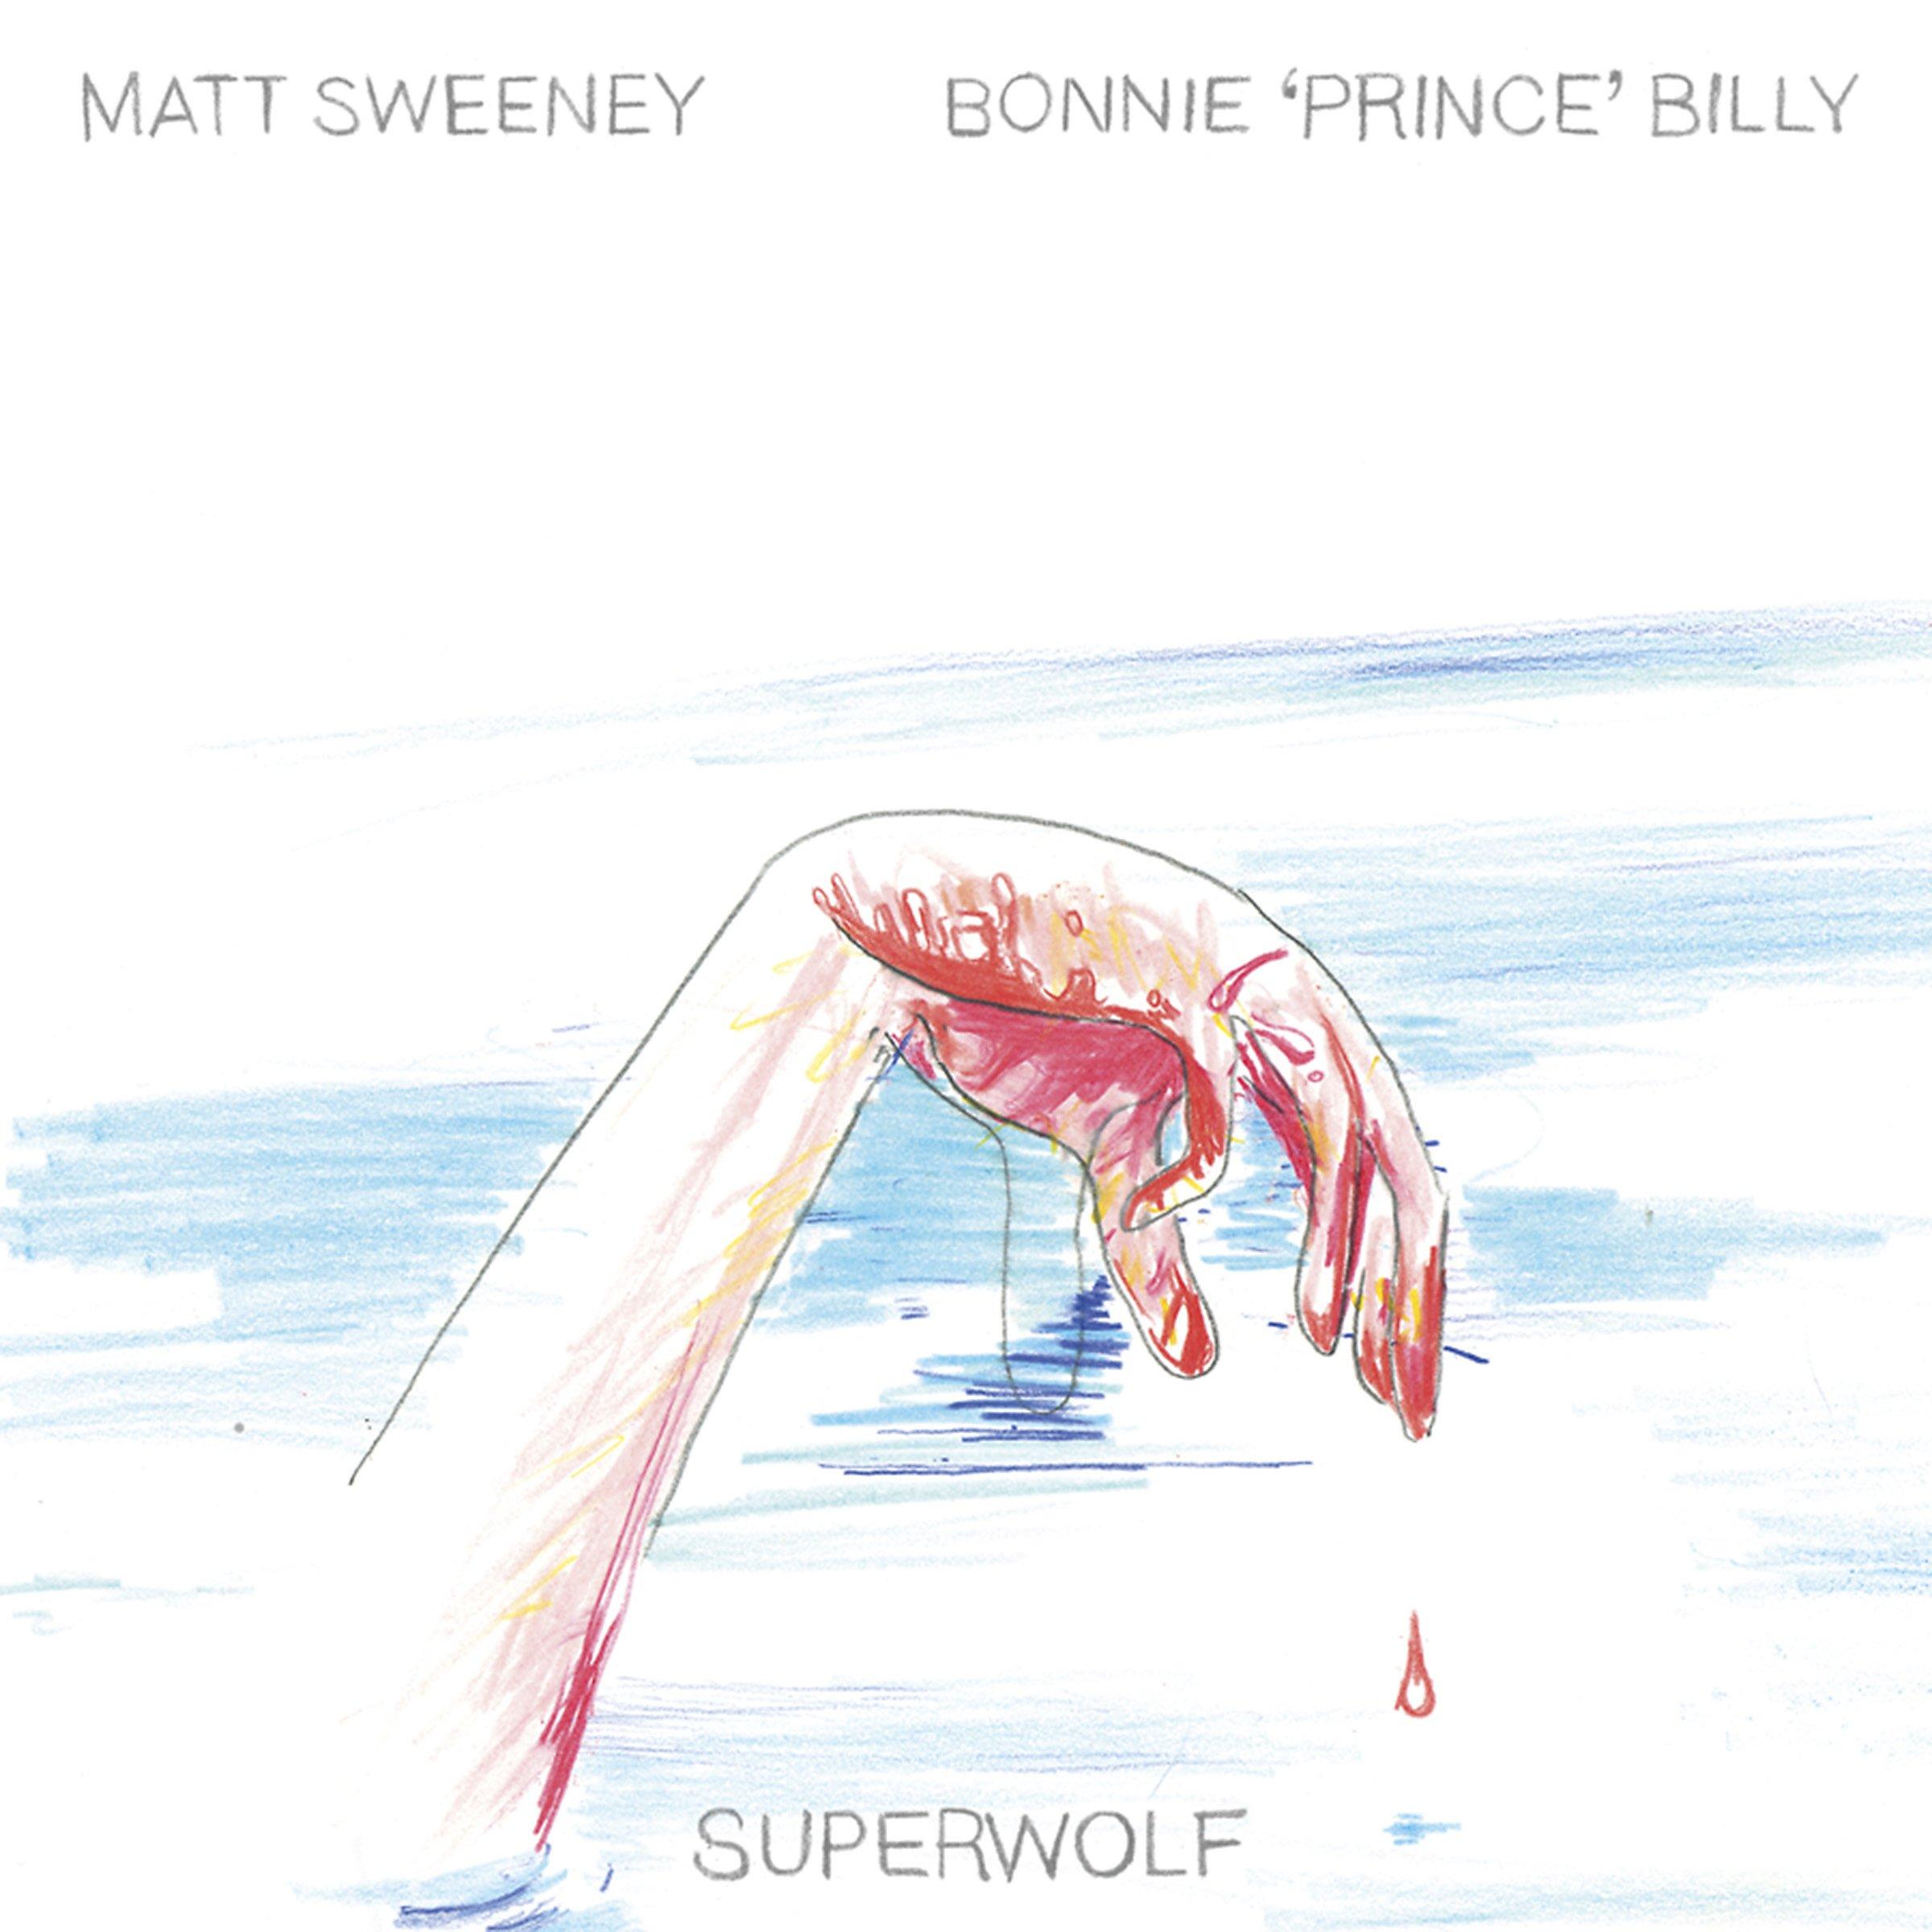 Matt Sweeney And Bonnie Prince Billy – Superwolf (2005) [FLAC]